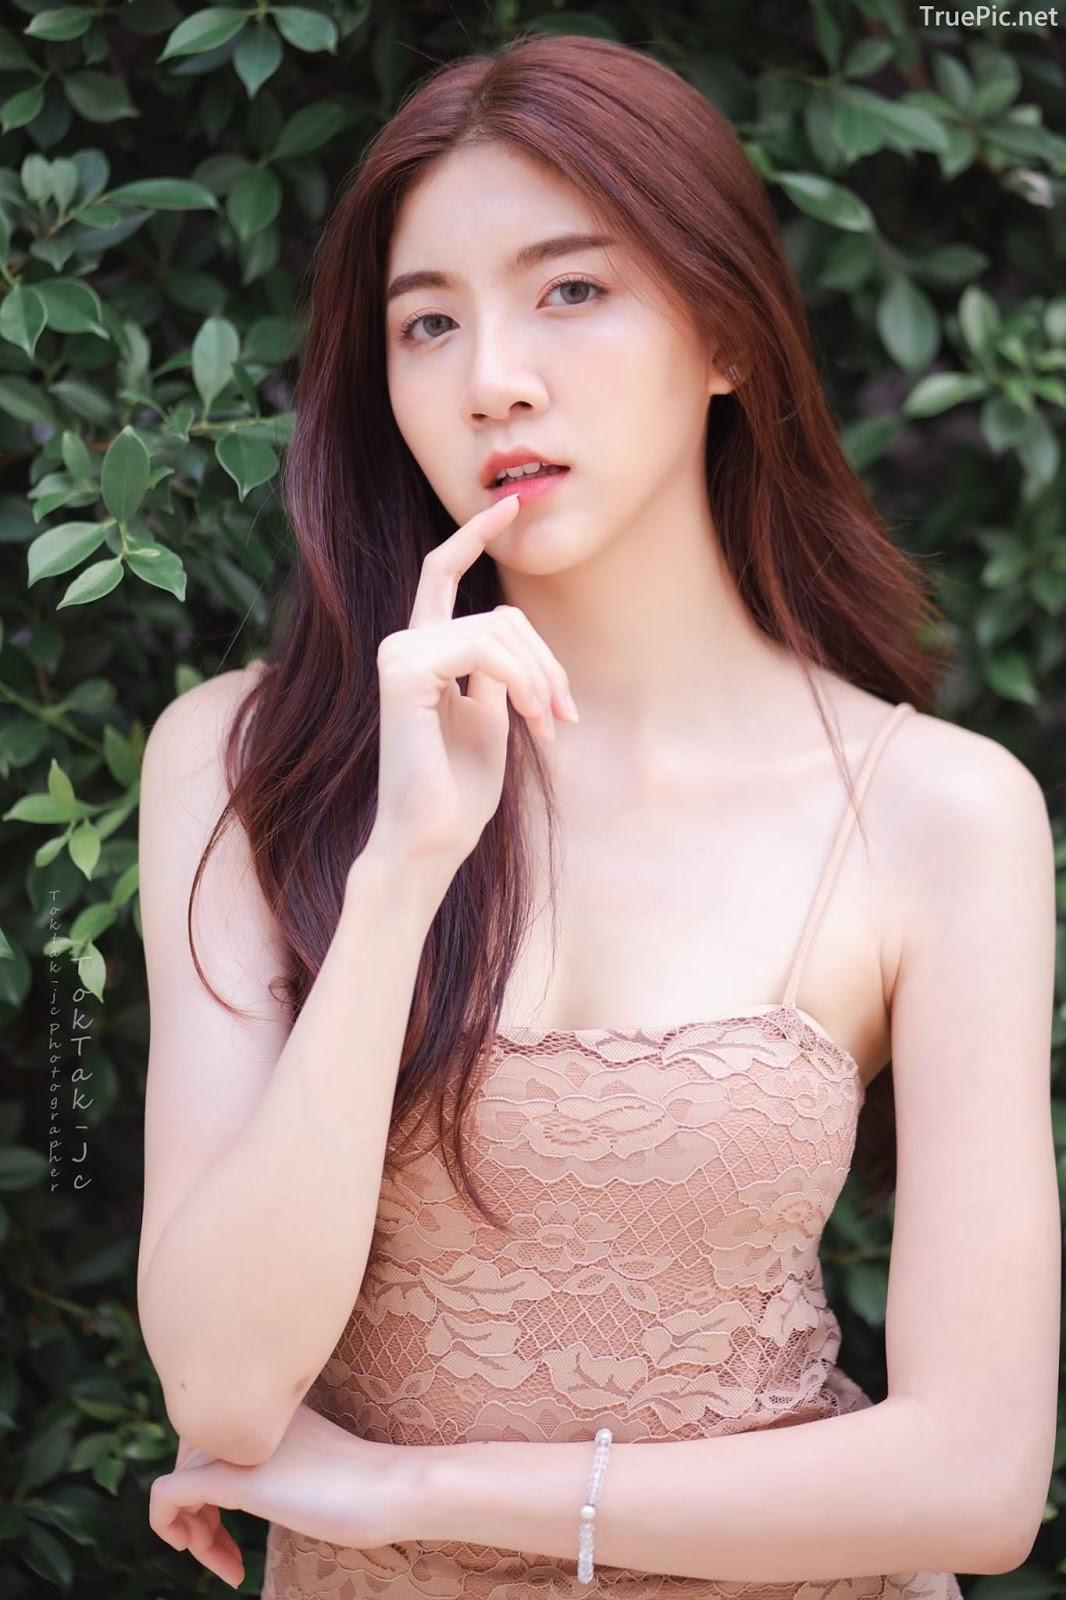 Thailand angel model Sasi Ngiunwan - Beauty portrait photoshoot - Picture 2